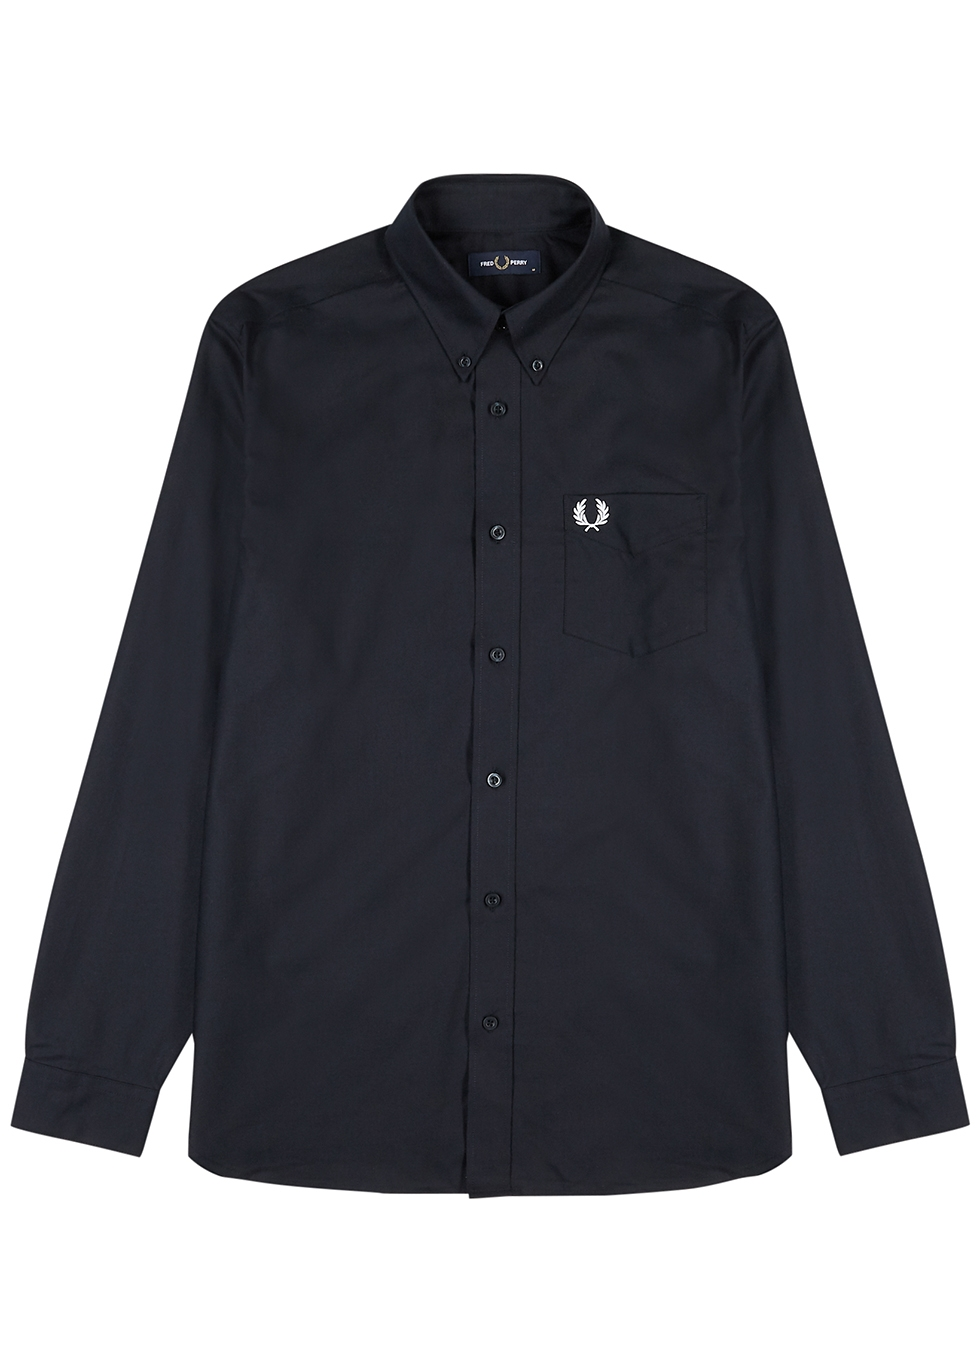 M8501 navy cotton Oxford shirt